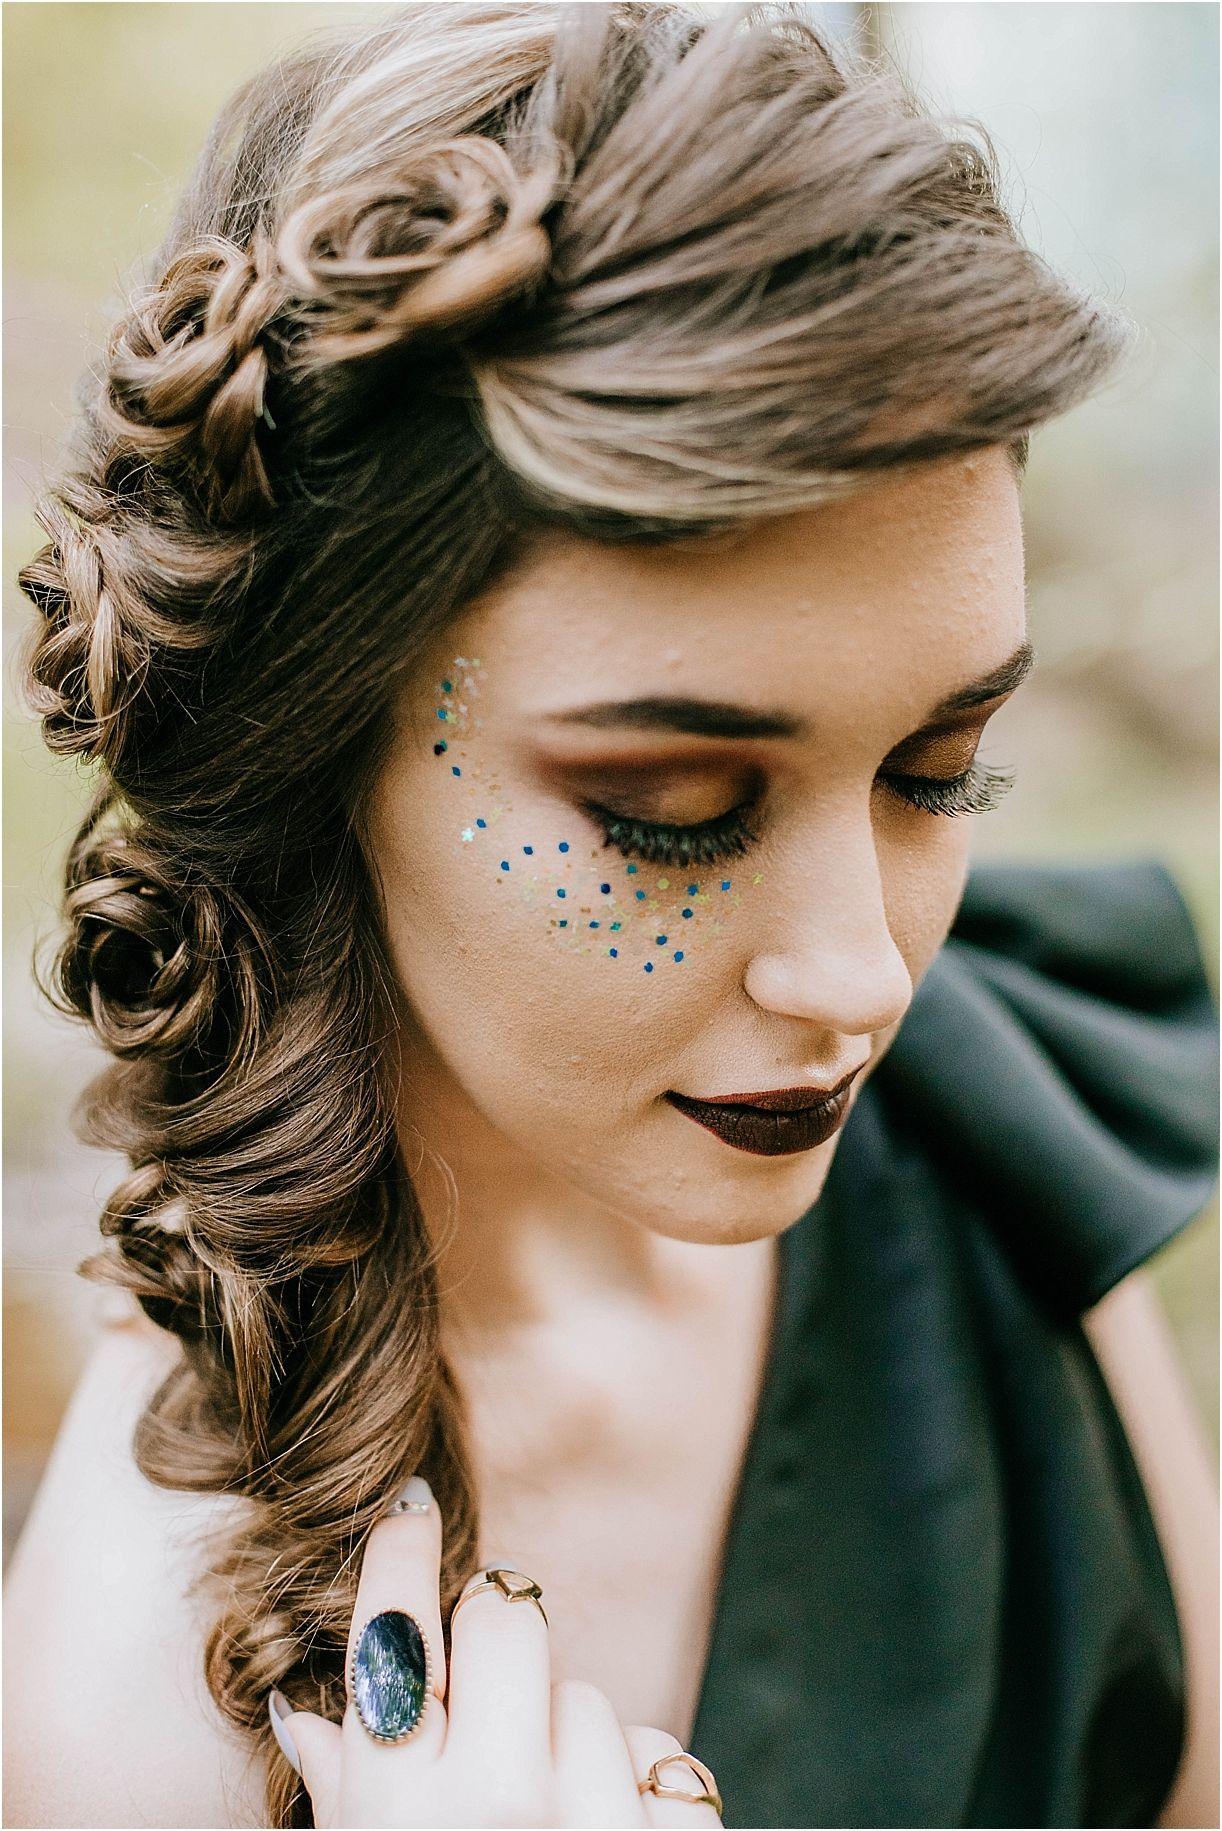 Eerily Elegant Halloween Wedding Ideas Halloween Wedding Halloween Bride Halloween Wedding Dresses